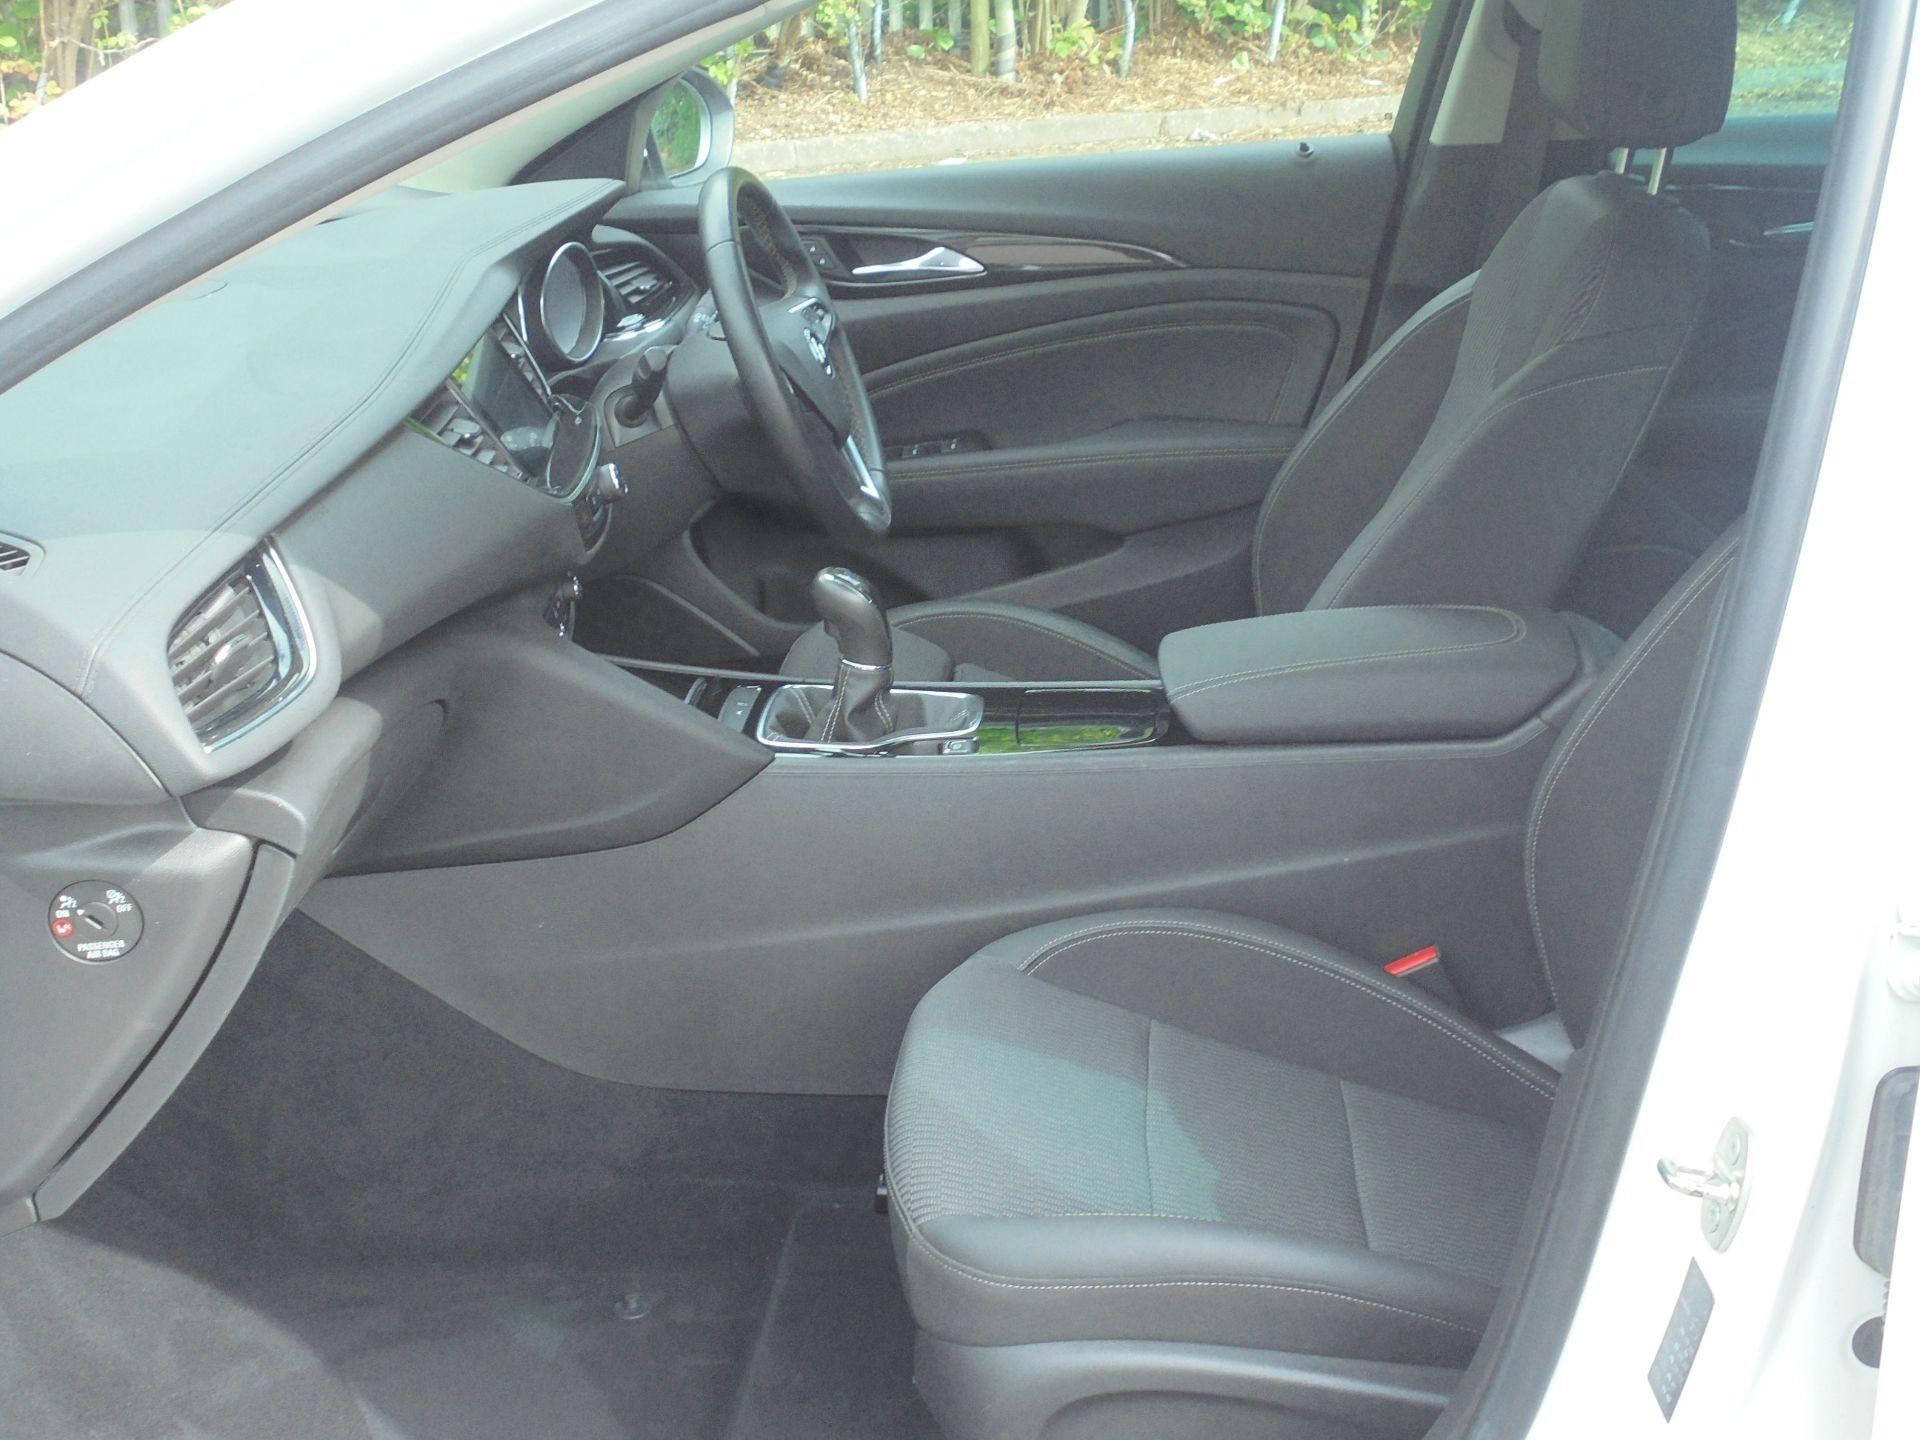 2018 Vauxhall Insignia 1.6 Grand Sport Turbo D Ecotec [136] Sri Nav 5Dr (VU18DFG) Image 6